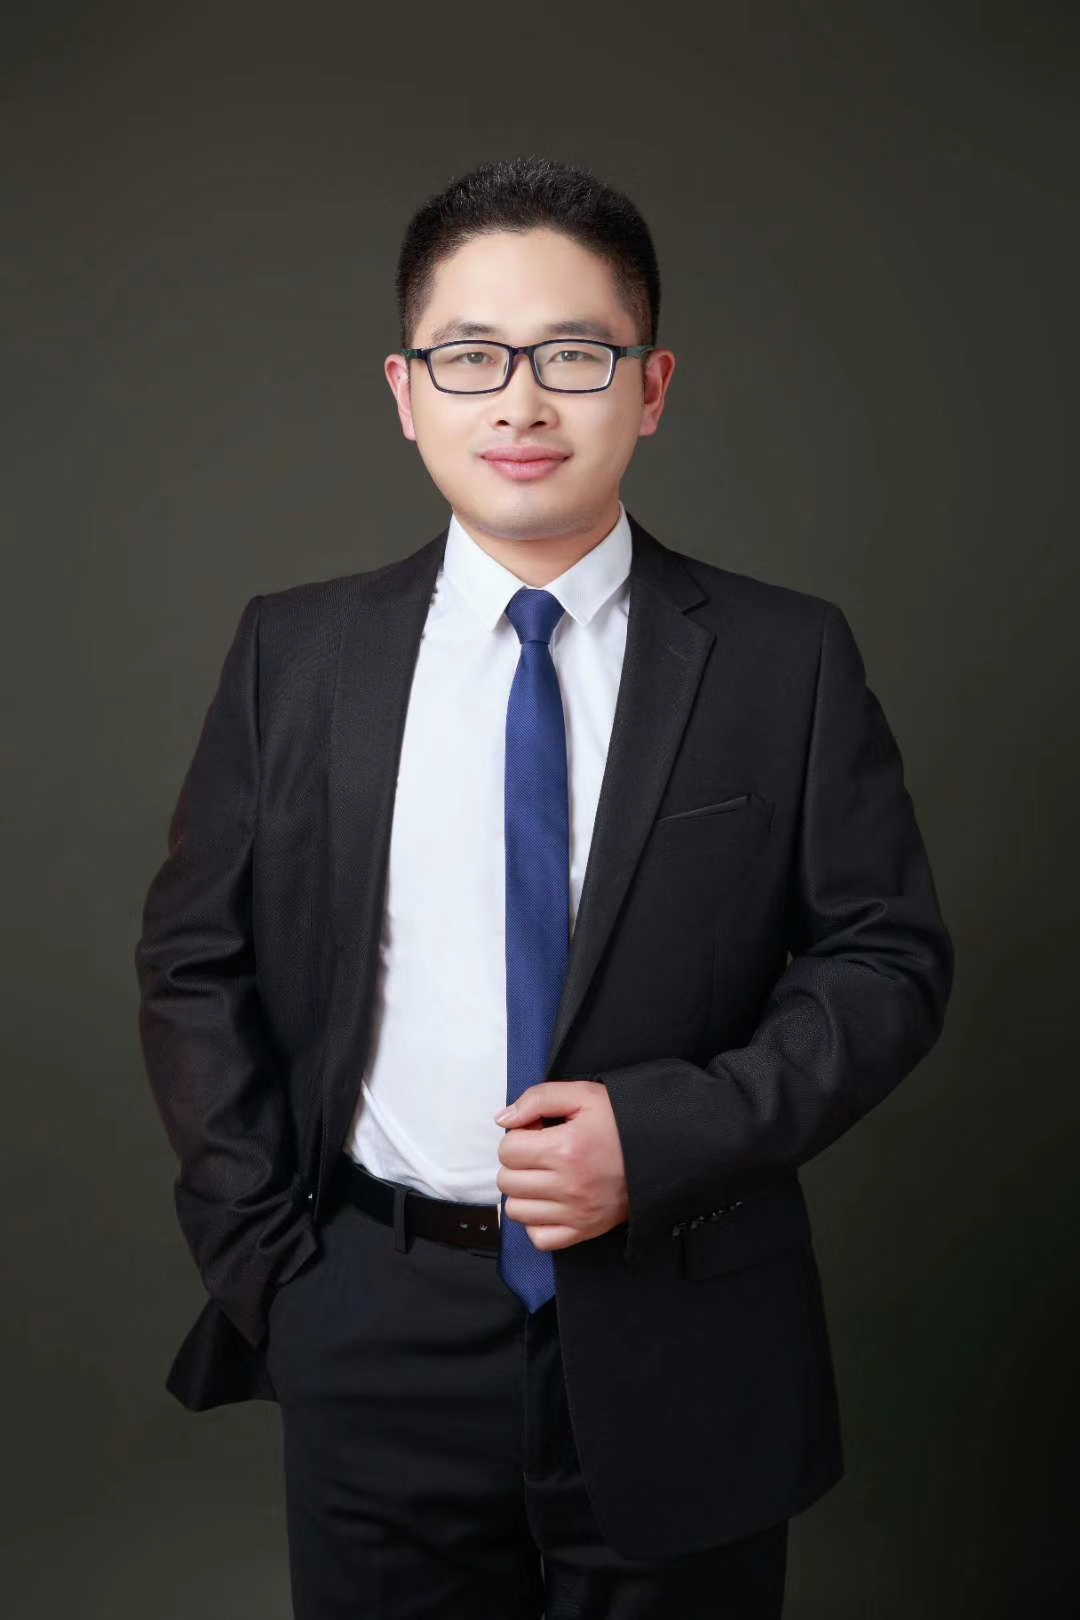 title='李冬雪实习律师'